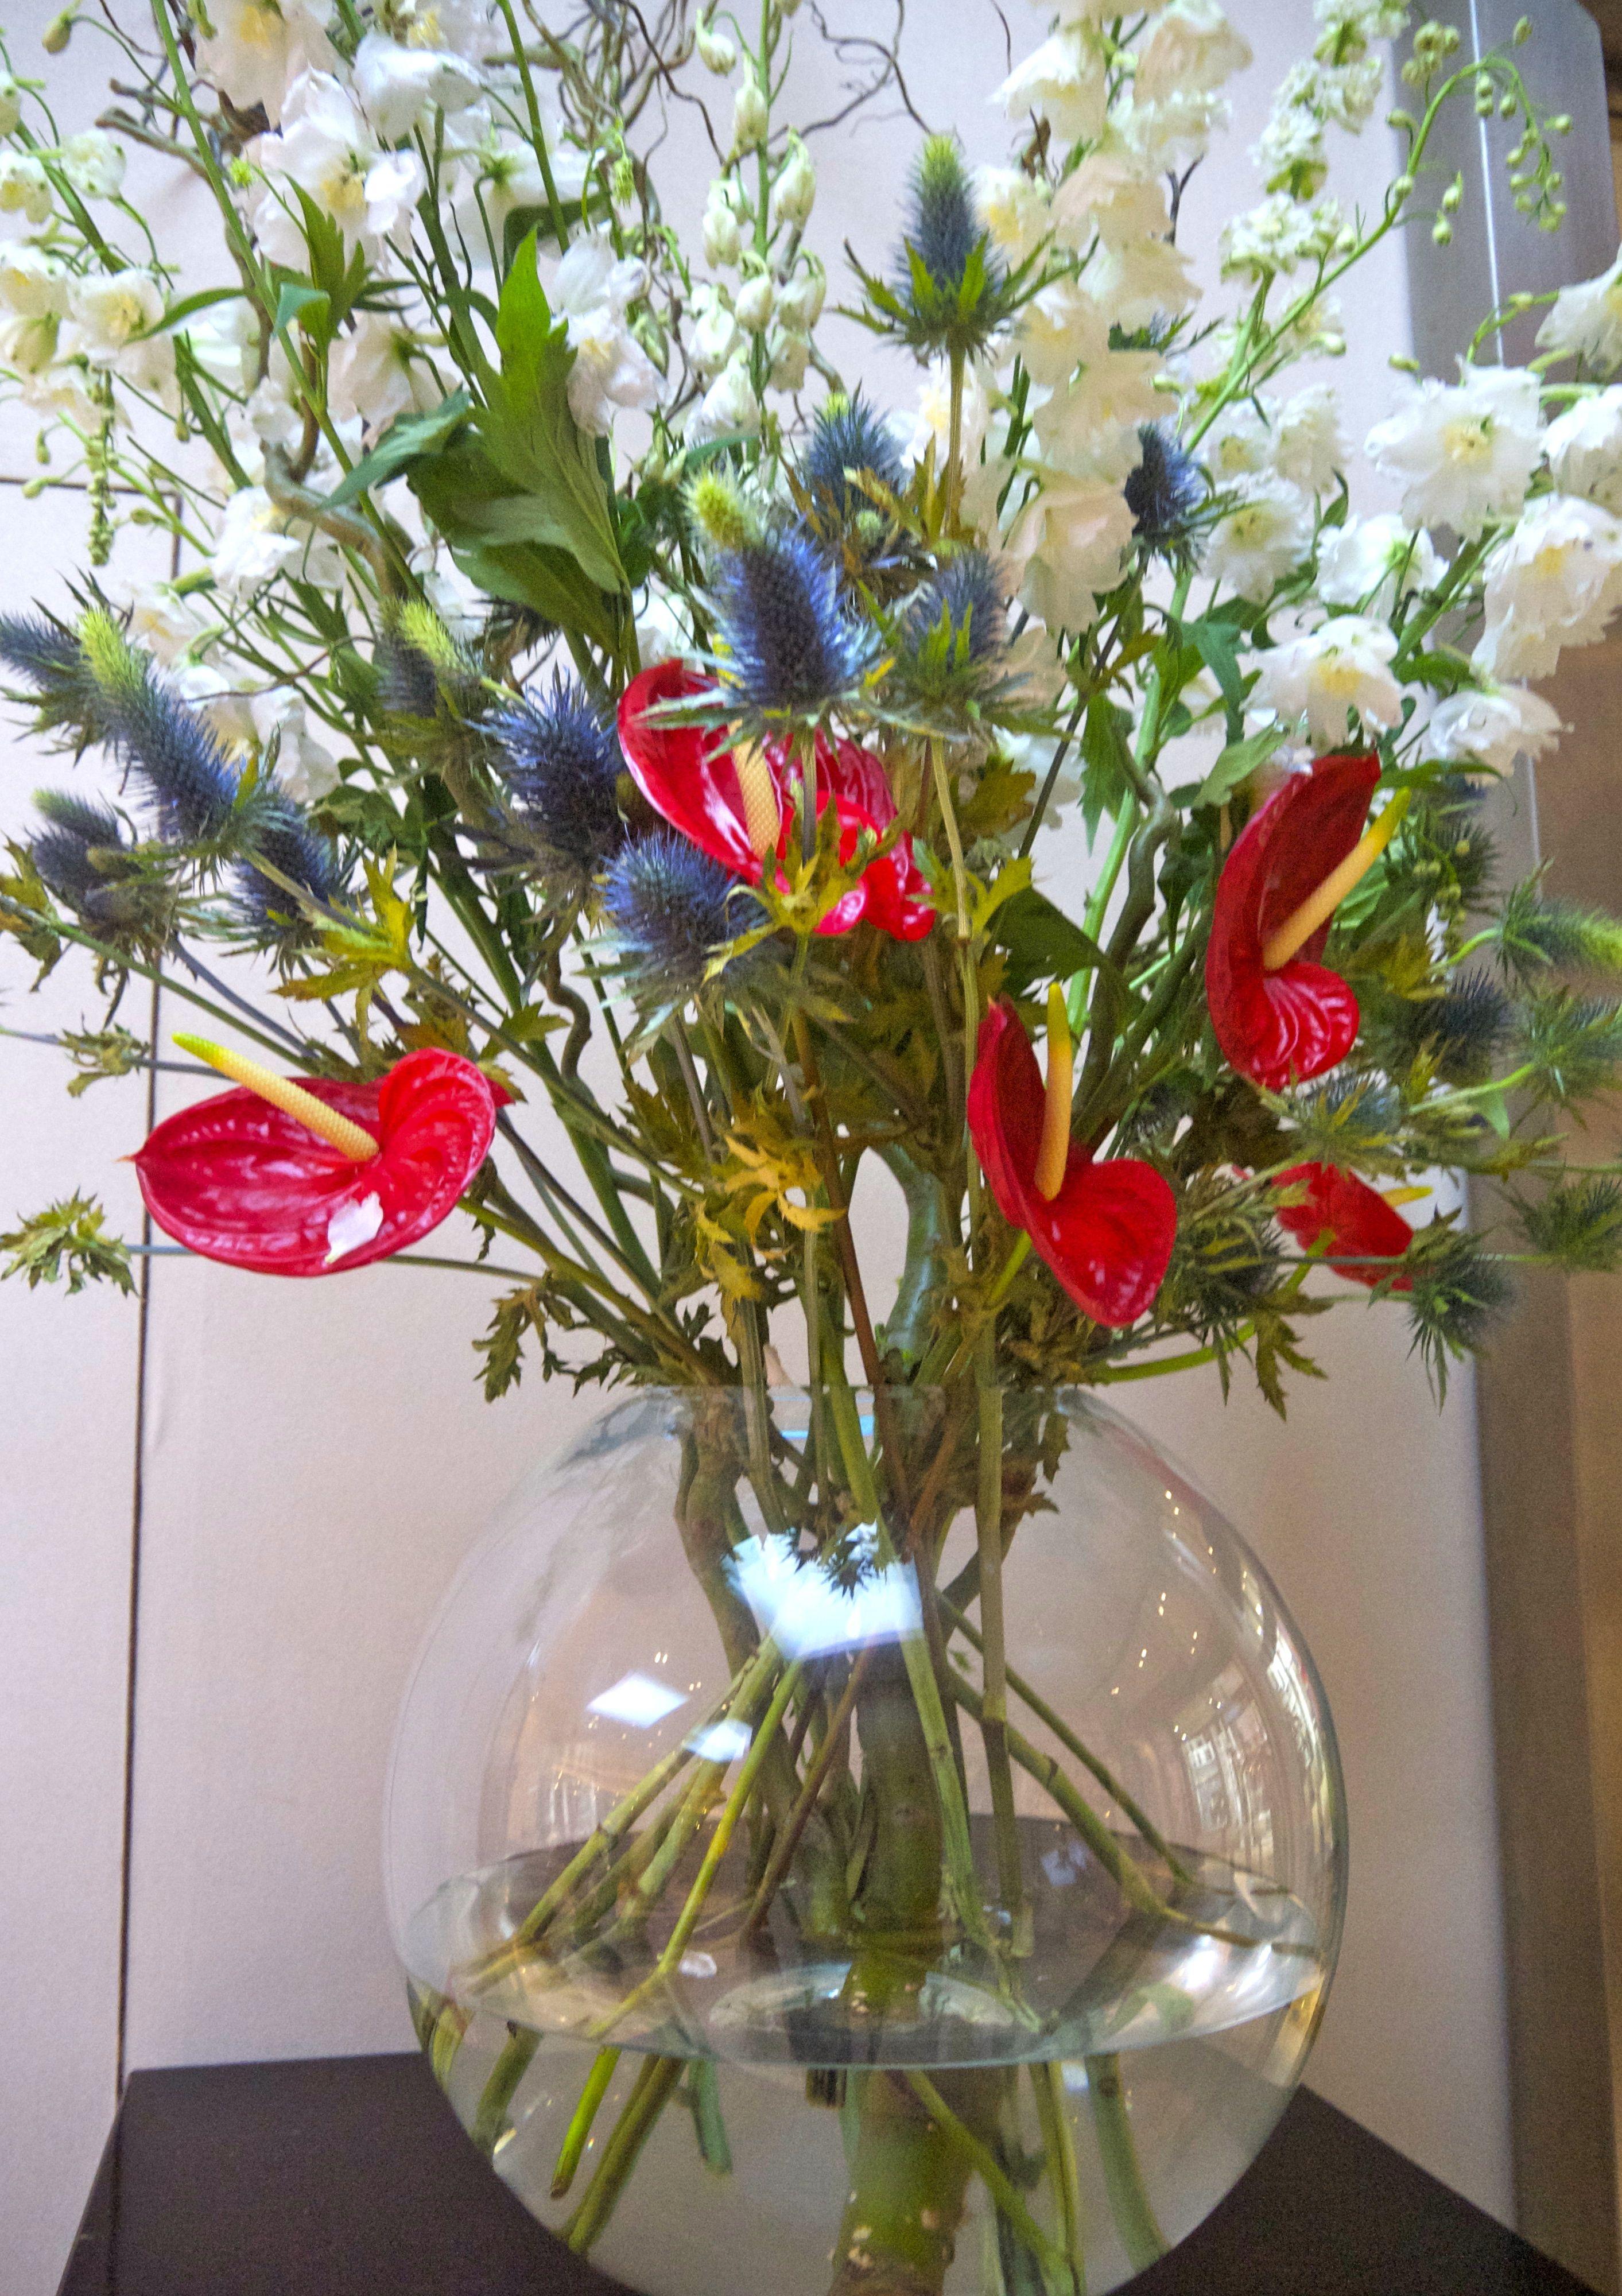 Floral display photo